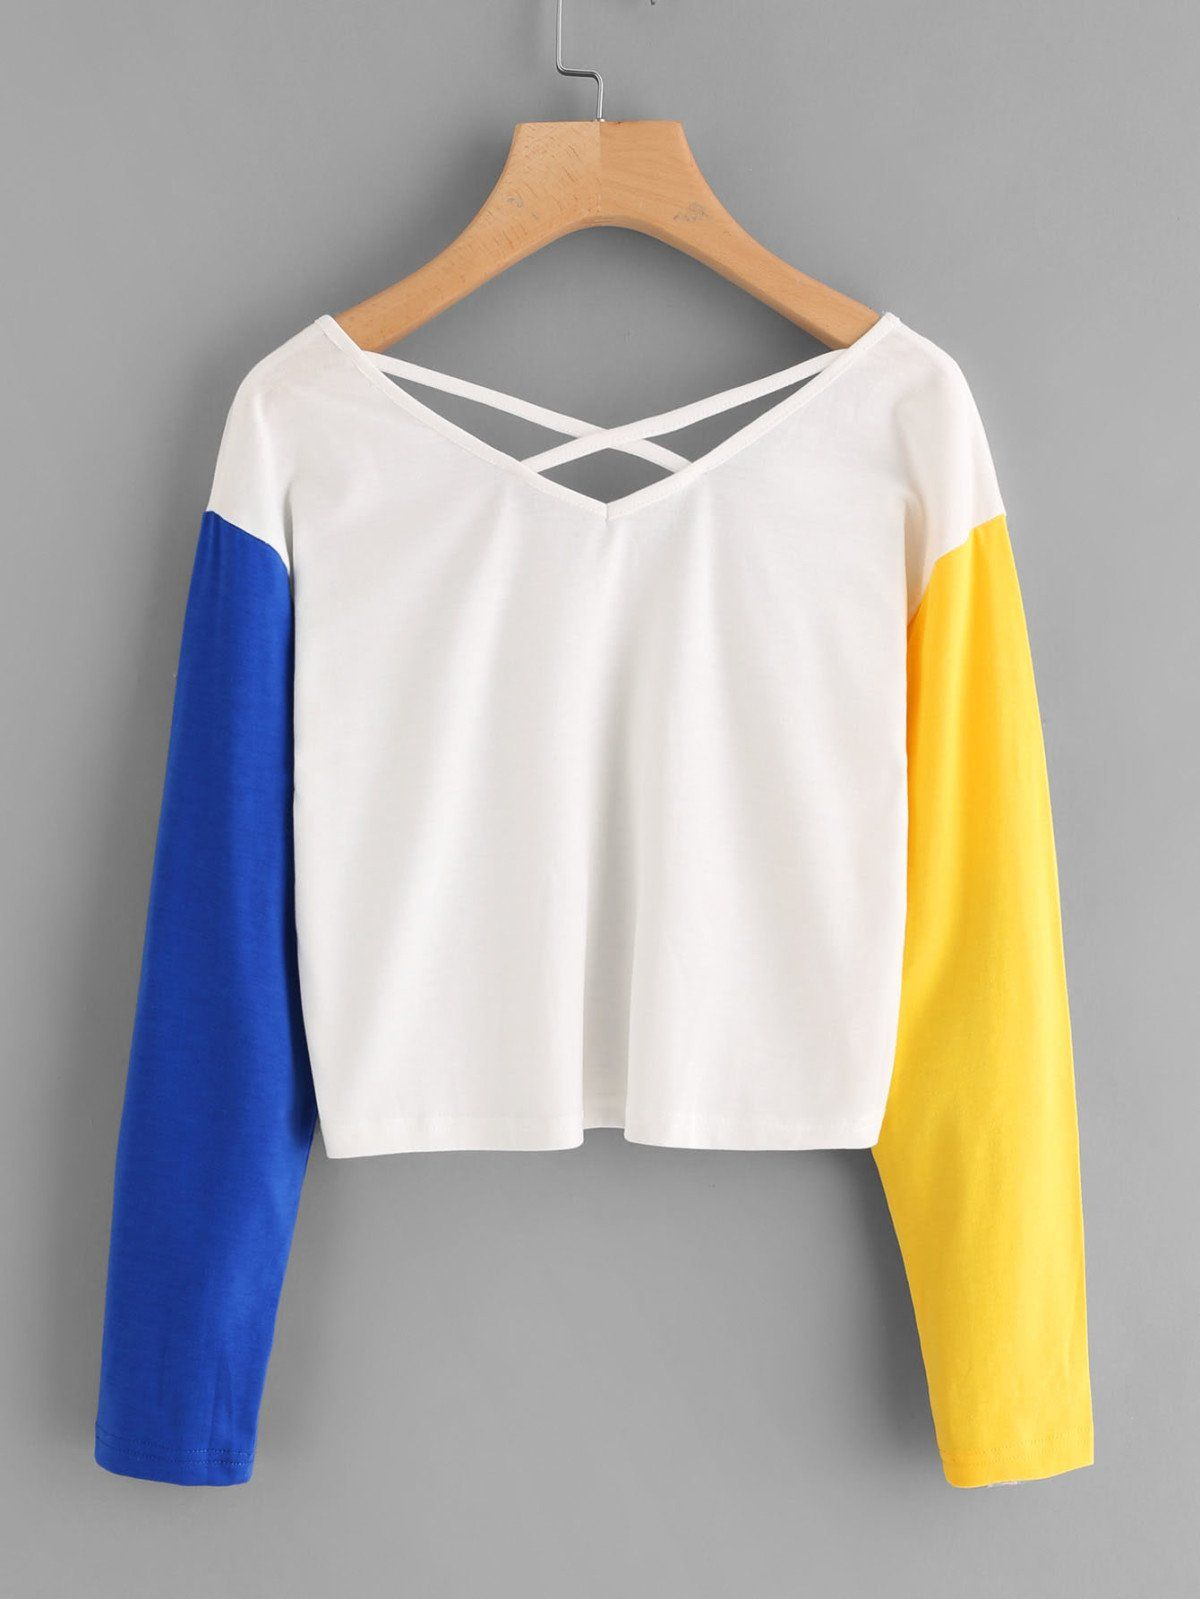 T-Shirts by BORNTOWEAR. Contrast Sleeve Criss Cross Back Crop Tee